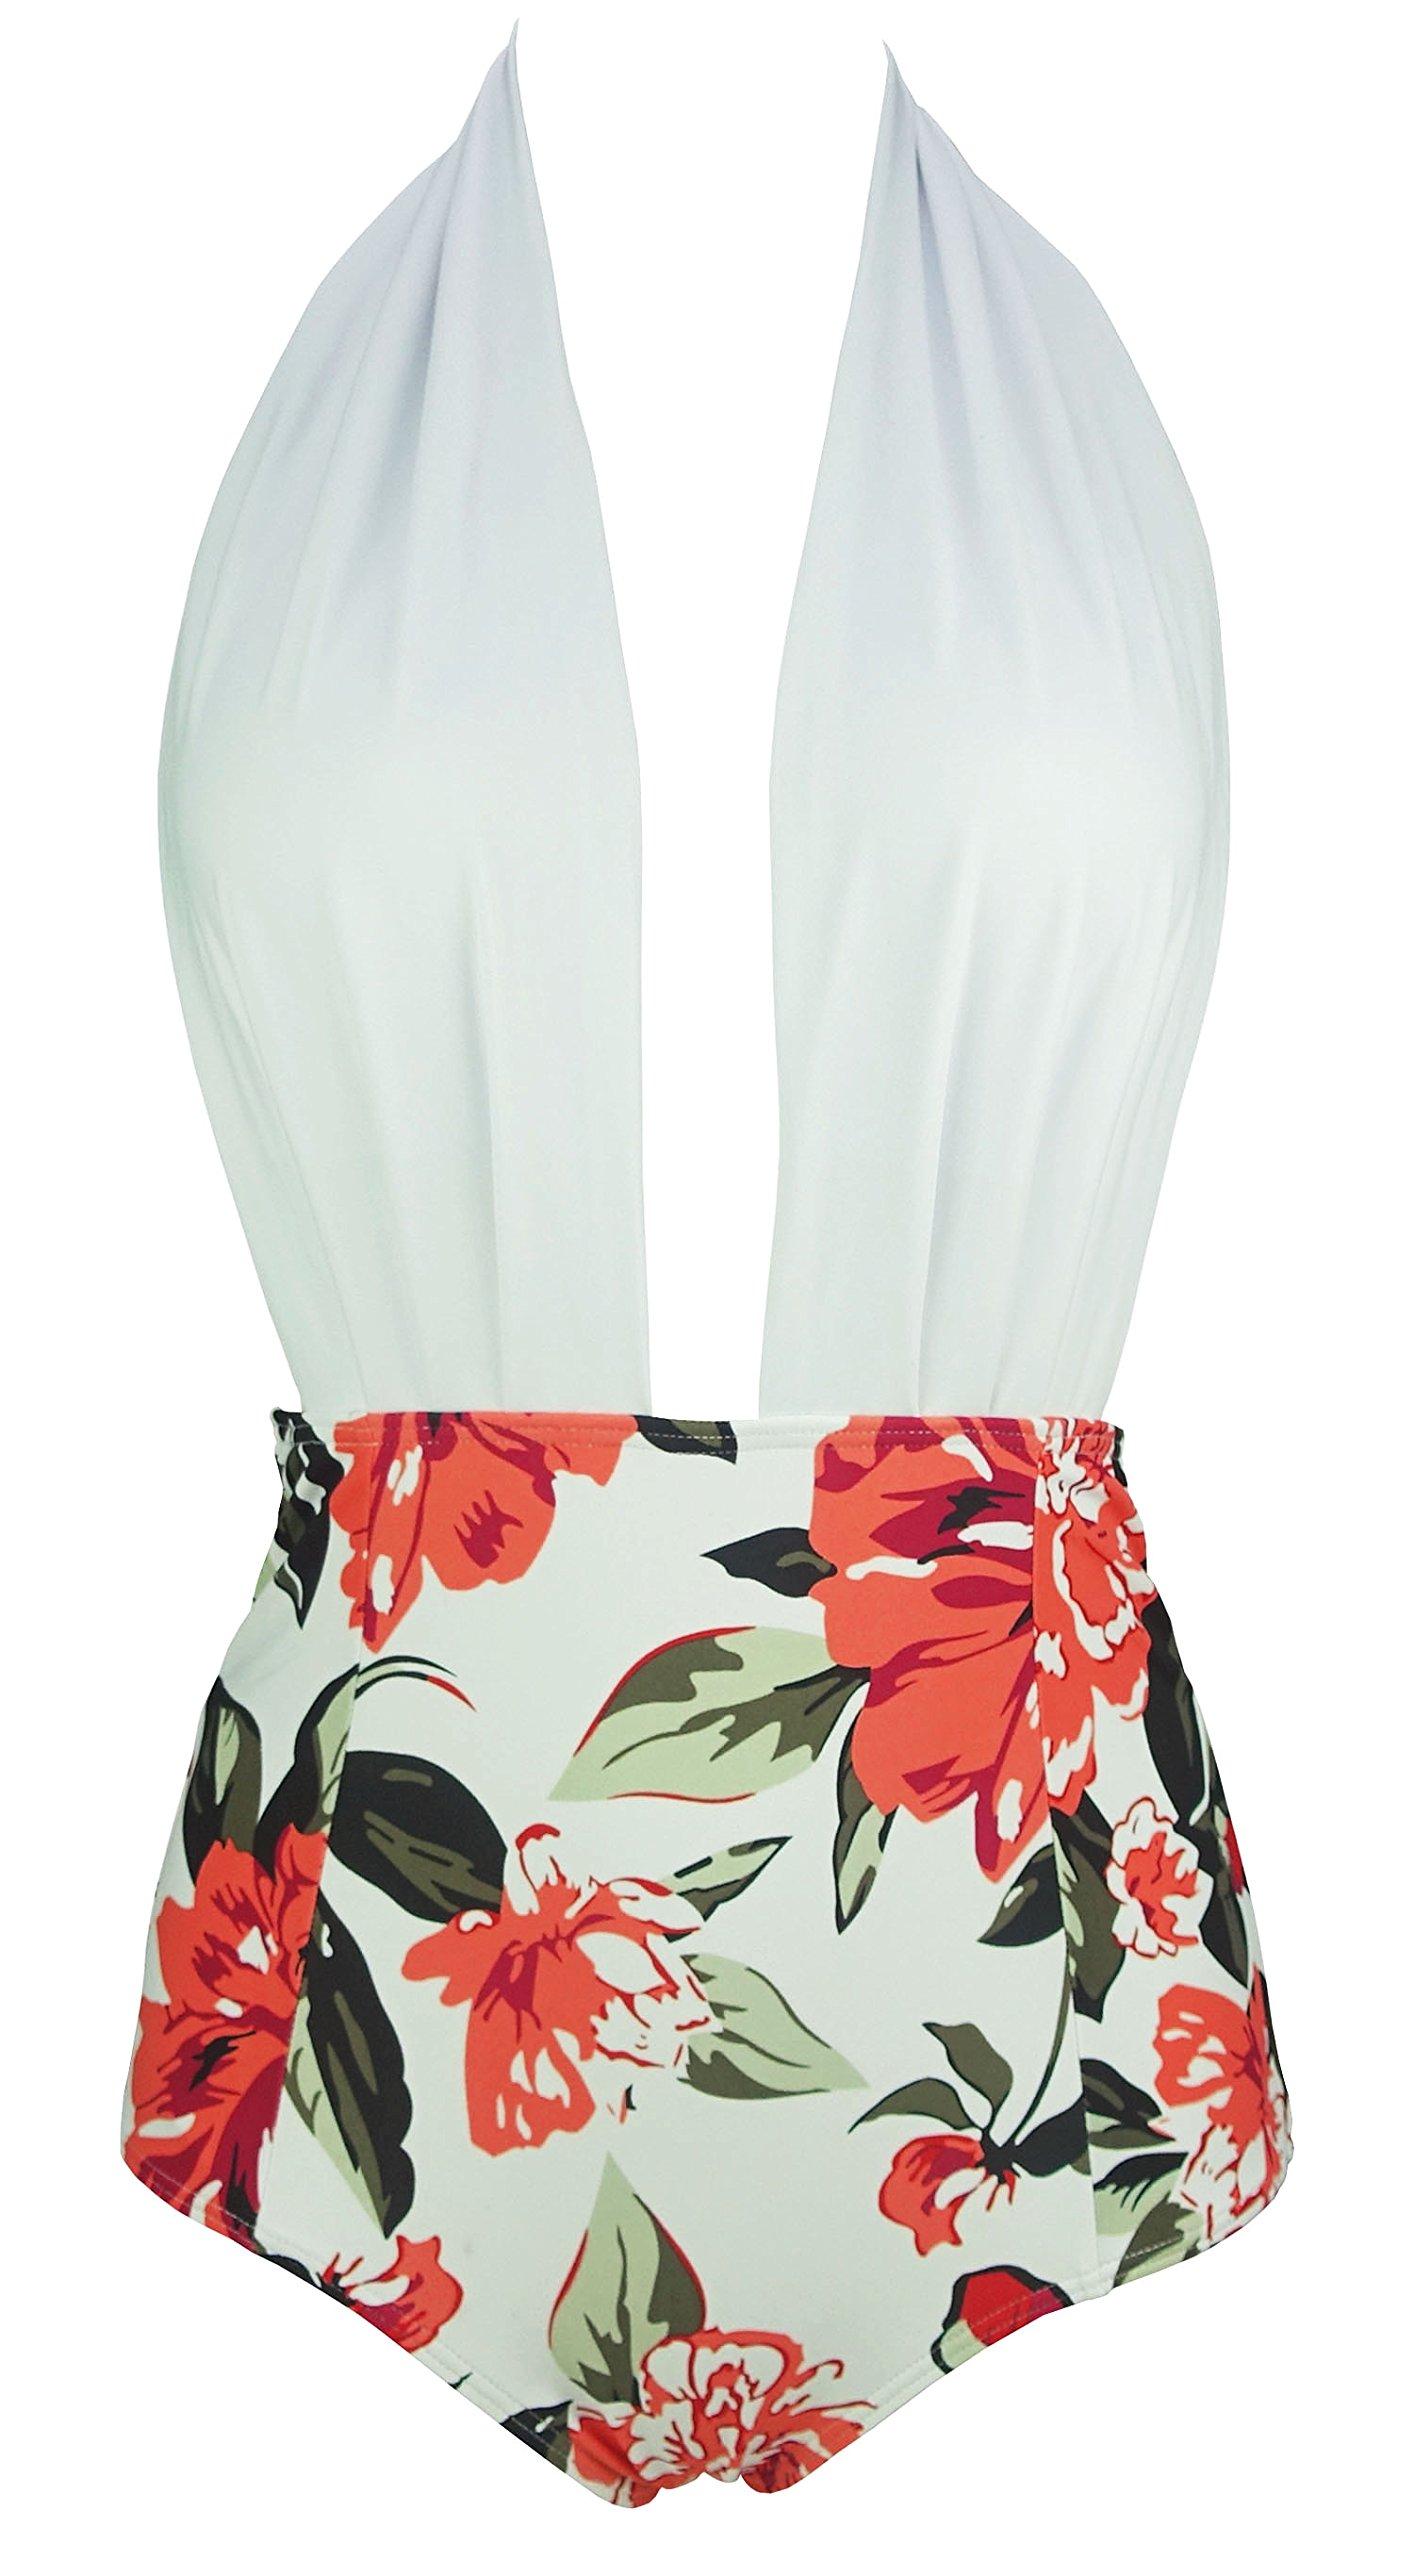 903117581d2ac1 Galleon - COCOSHIP White & Olive Orange Bloom Floral Plunging Neckline Retro  One Piece Backless Bather Swimsuit Pin Up Swimwear Beachwear XXXL